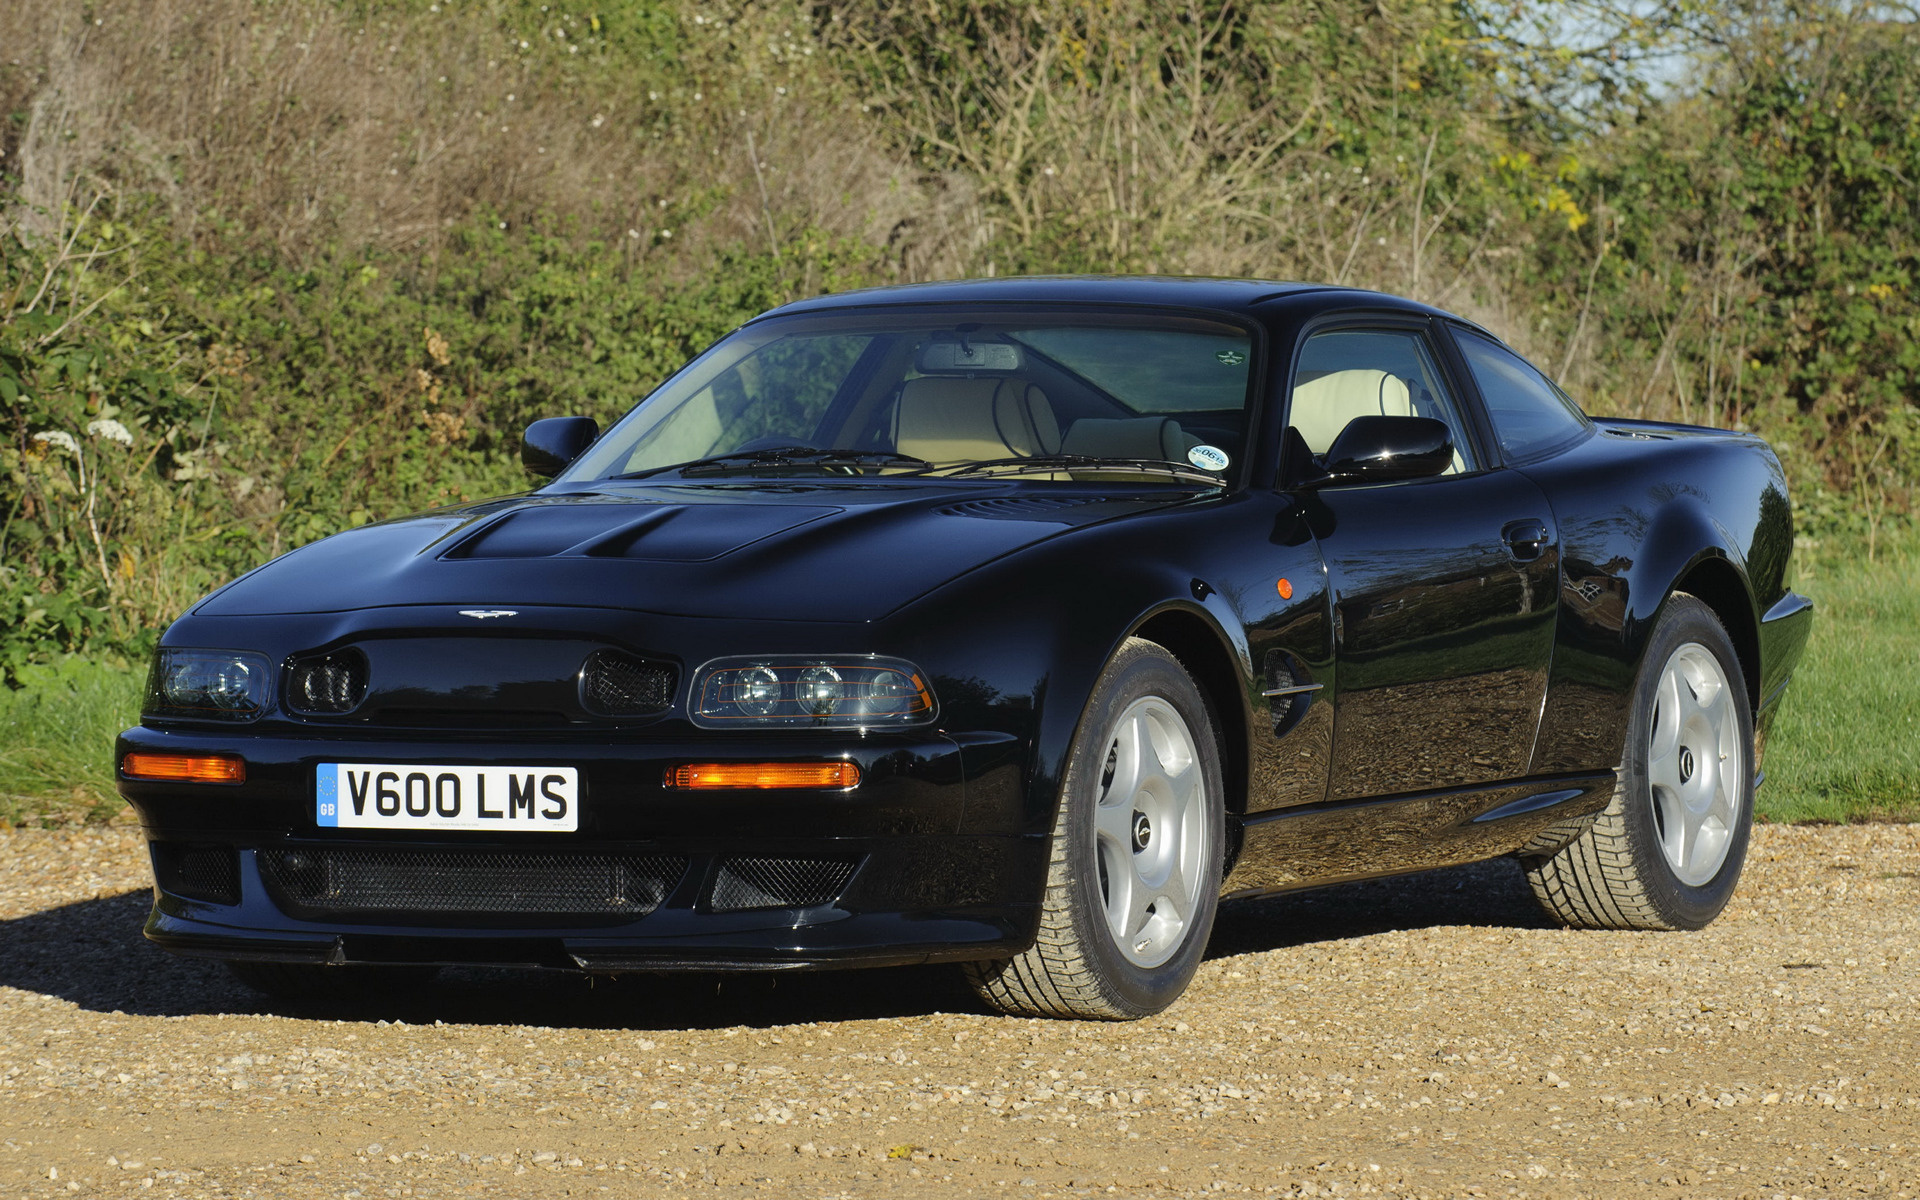 1999 Aston Martin V8 Vantage Le Mans Uk Wallpapers And Hd Images Car Pixel